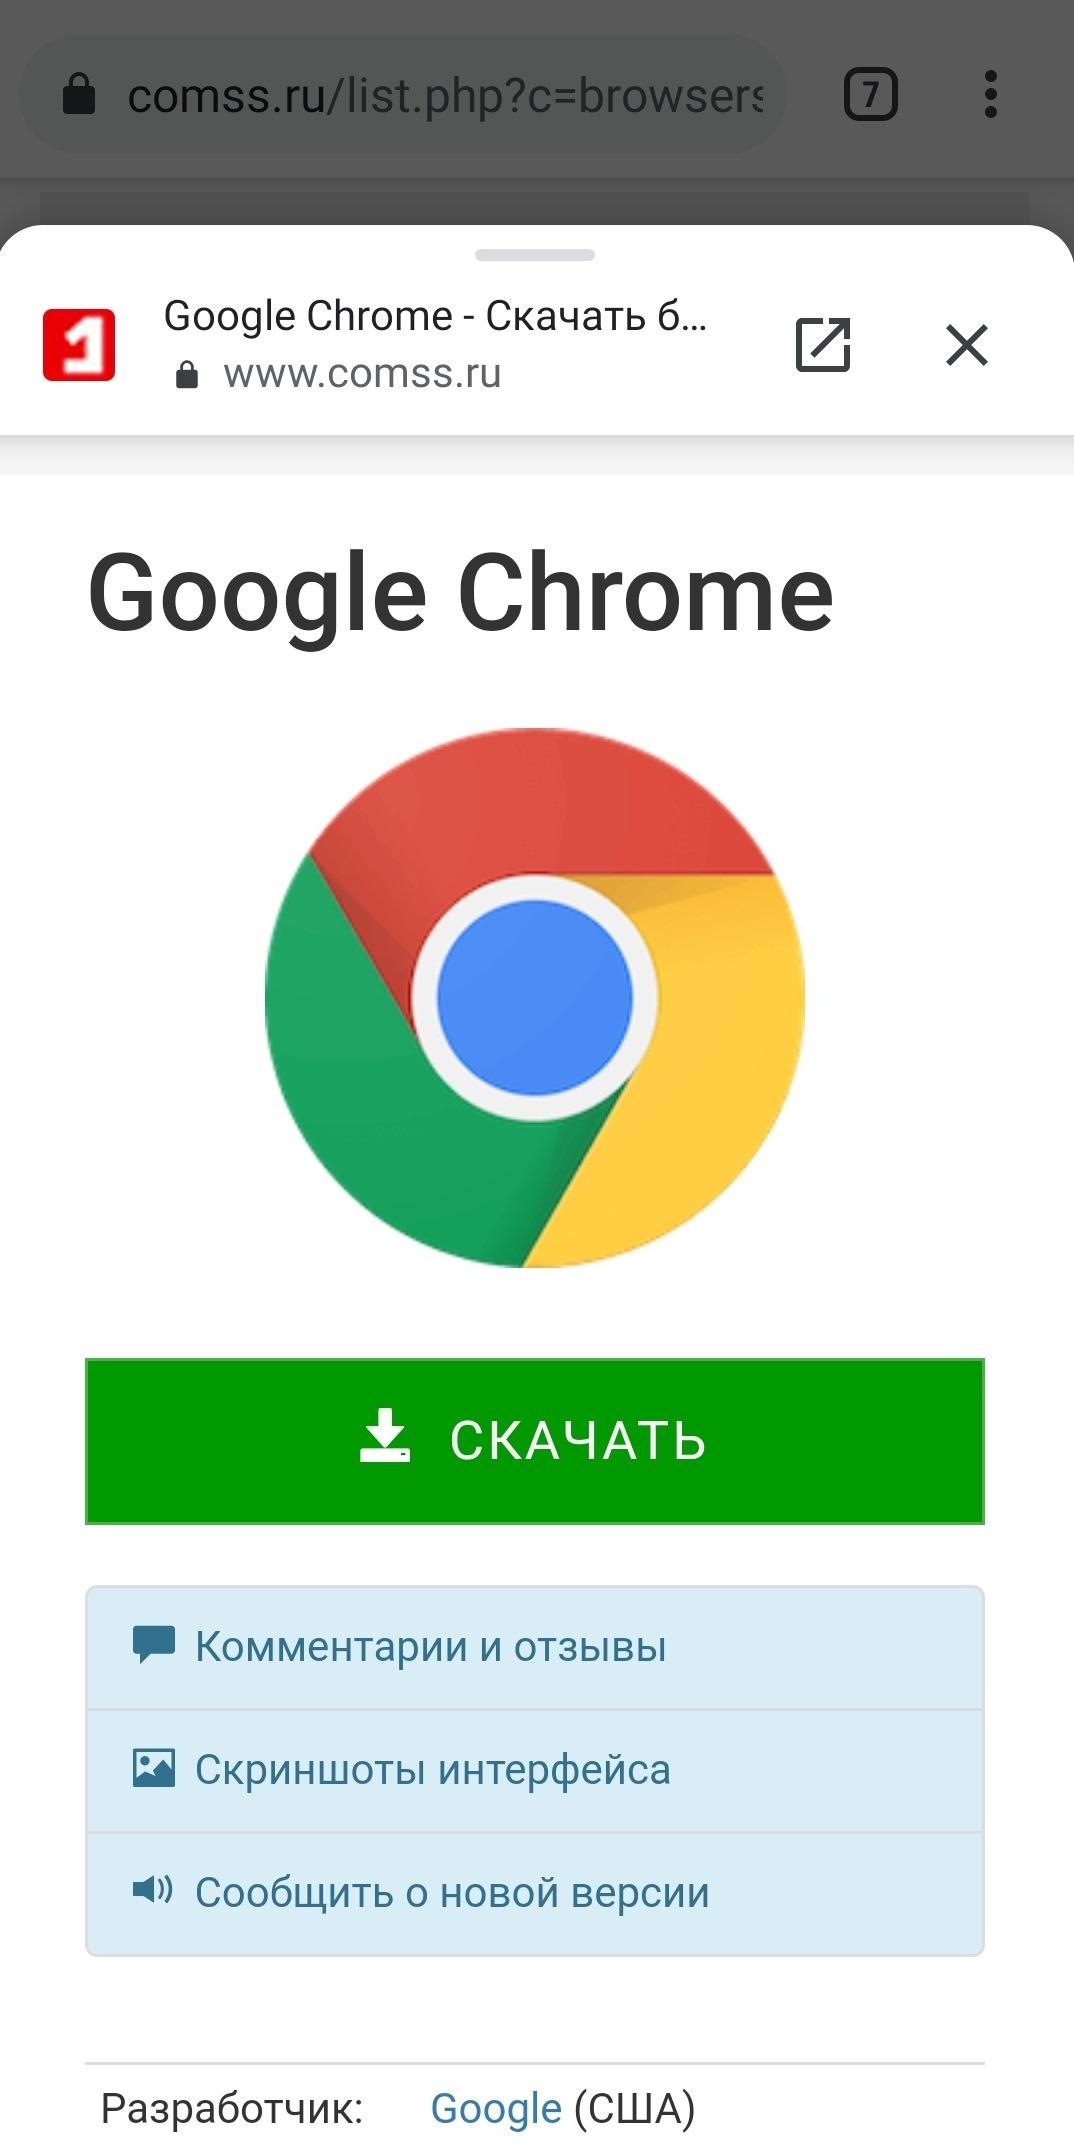 предпросмотр страниц Chrome